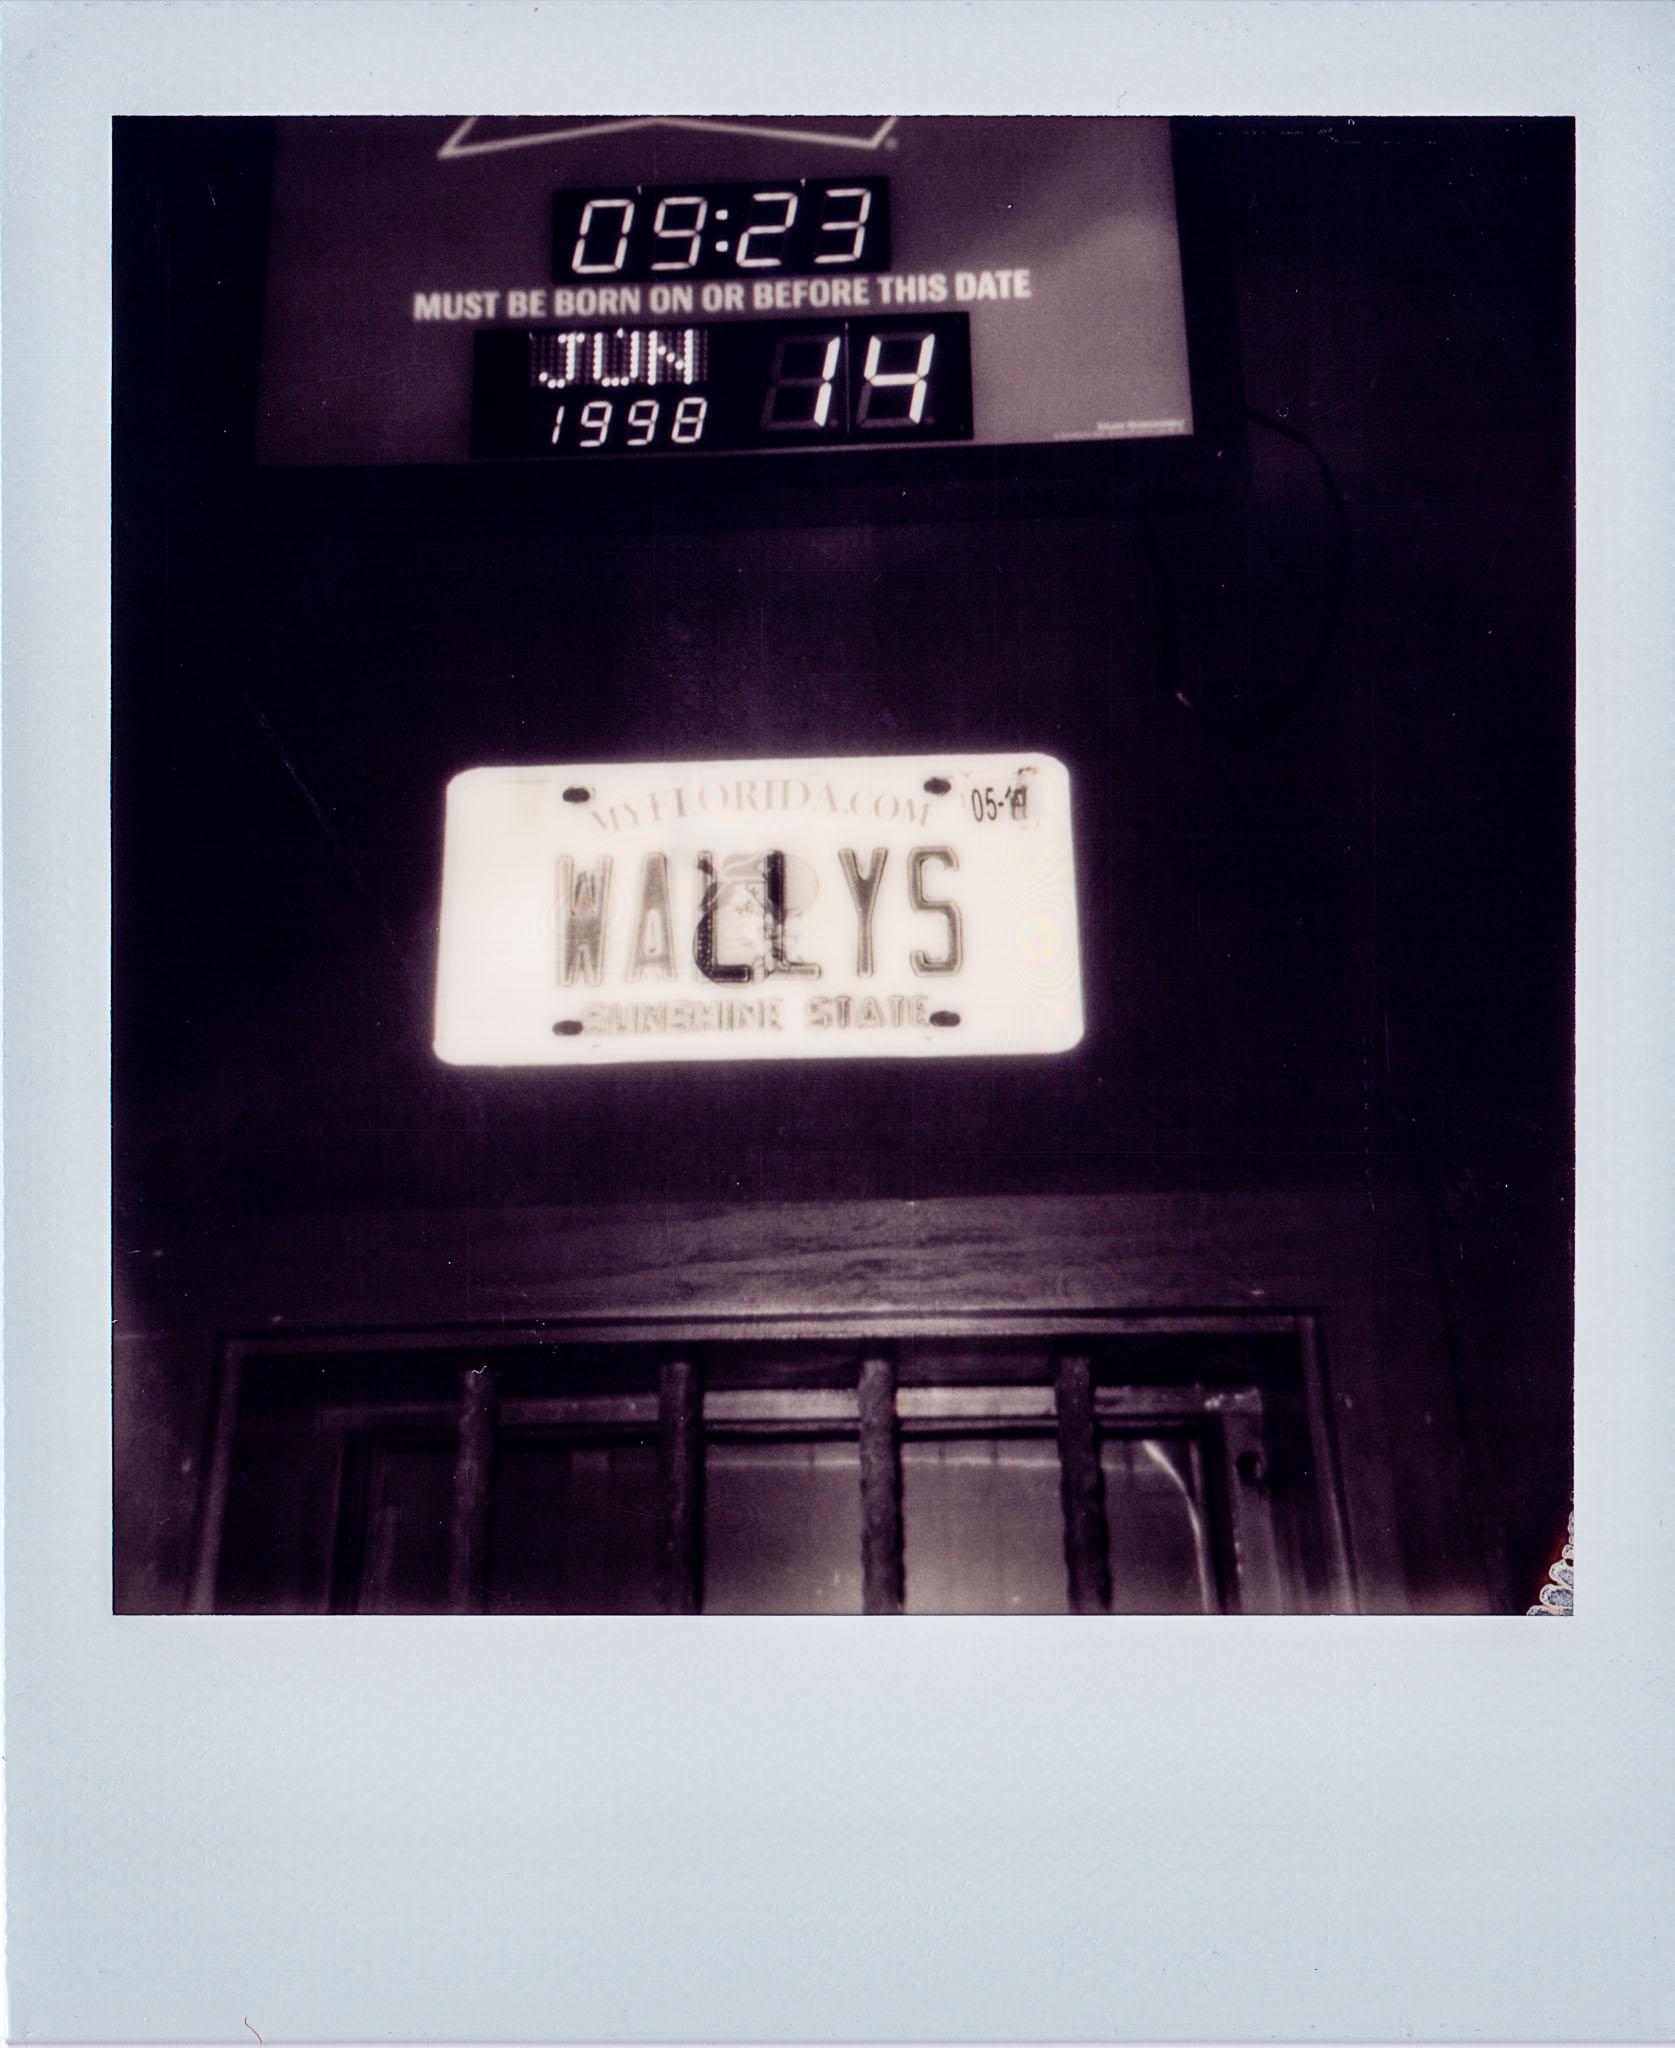 Wallys license hanging above the bar at Wallys Mills Avenue Liquors